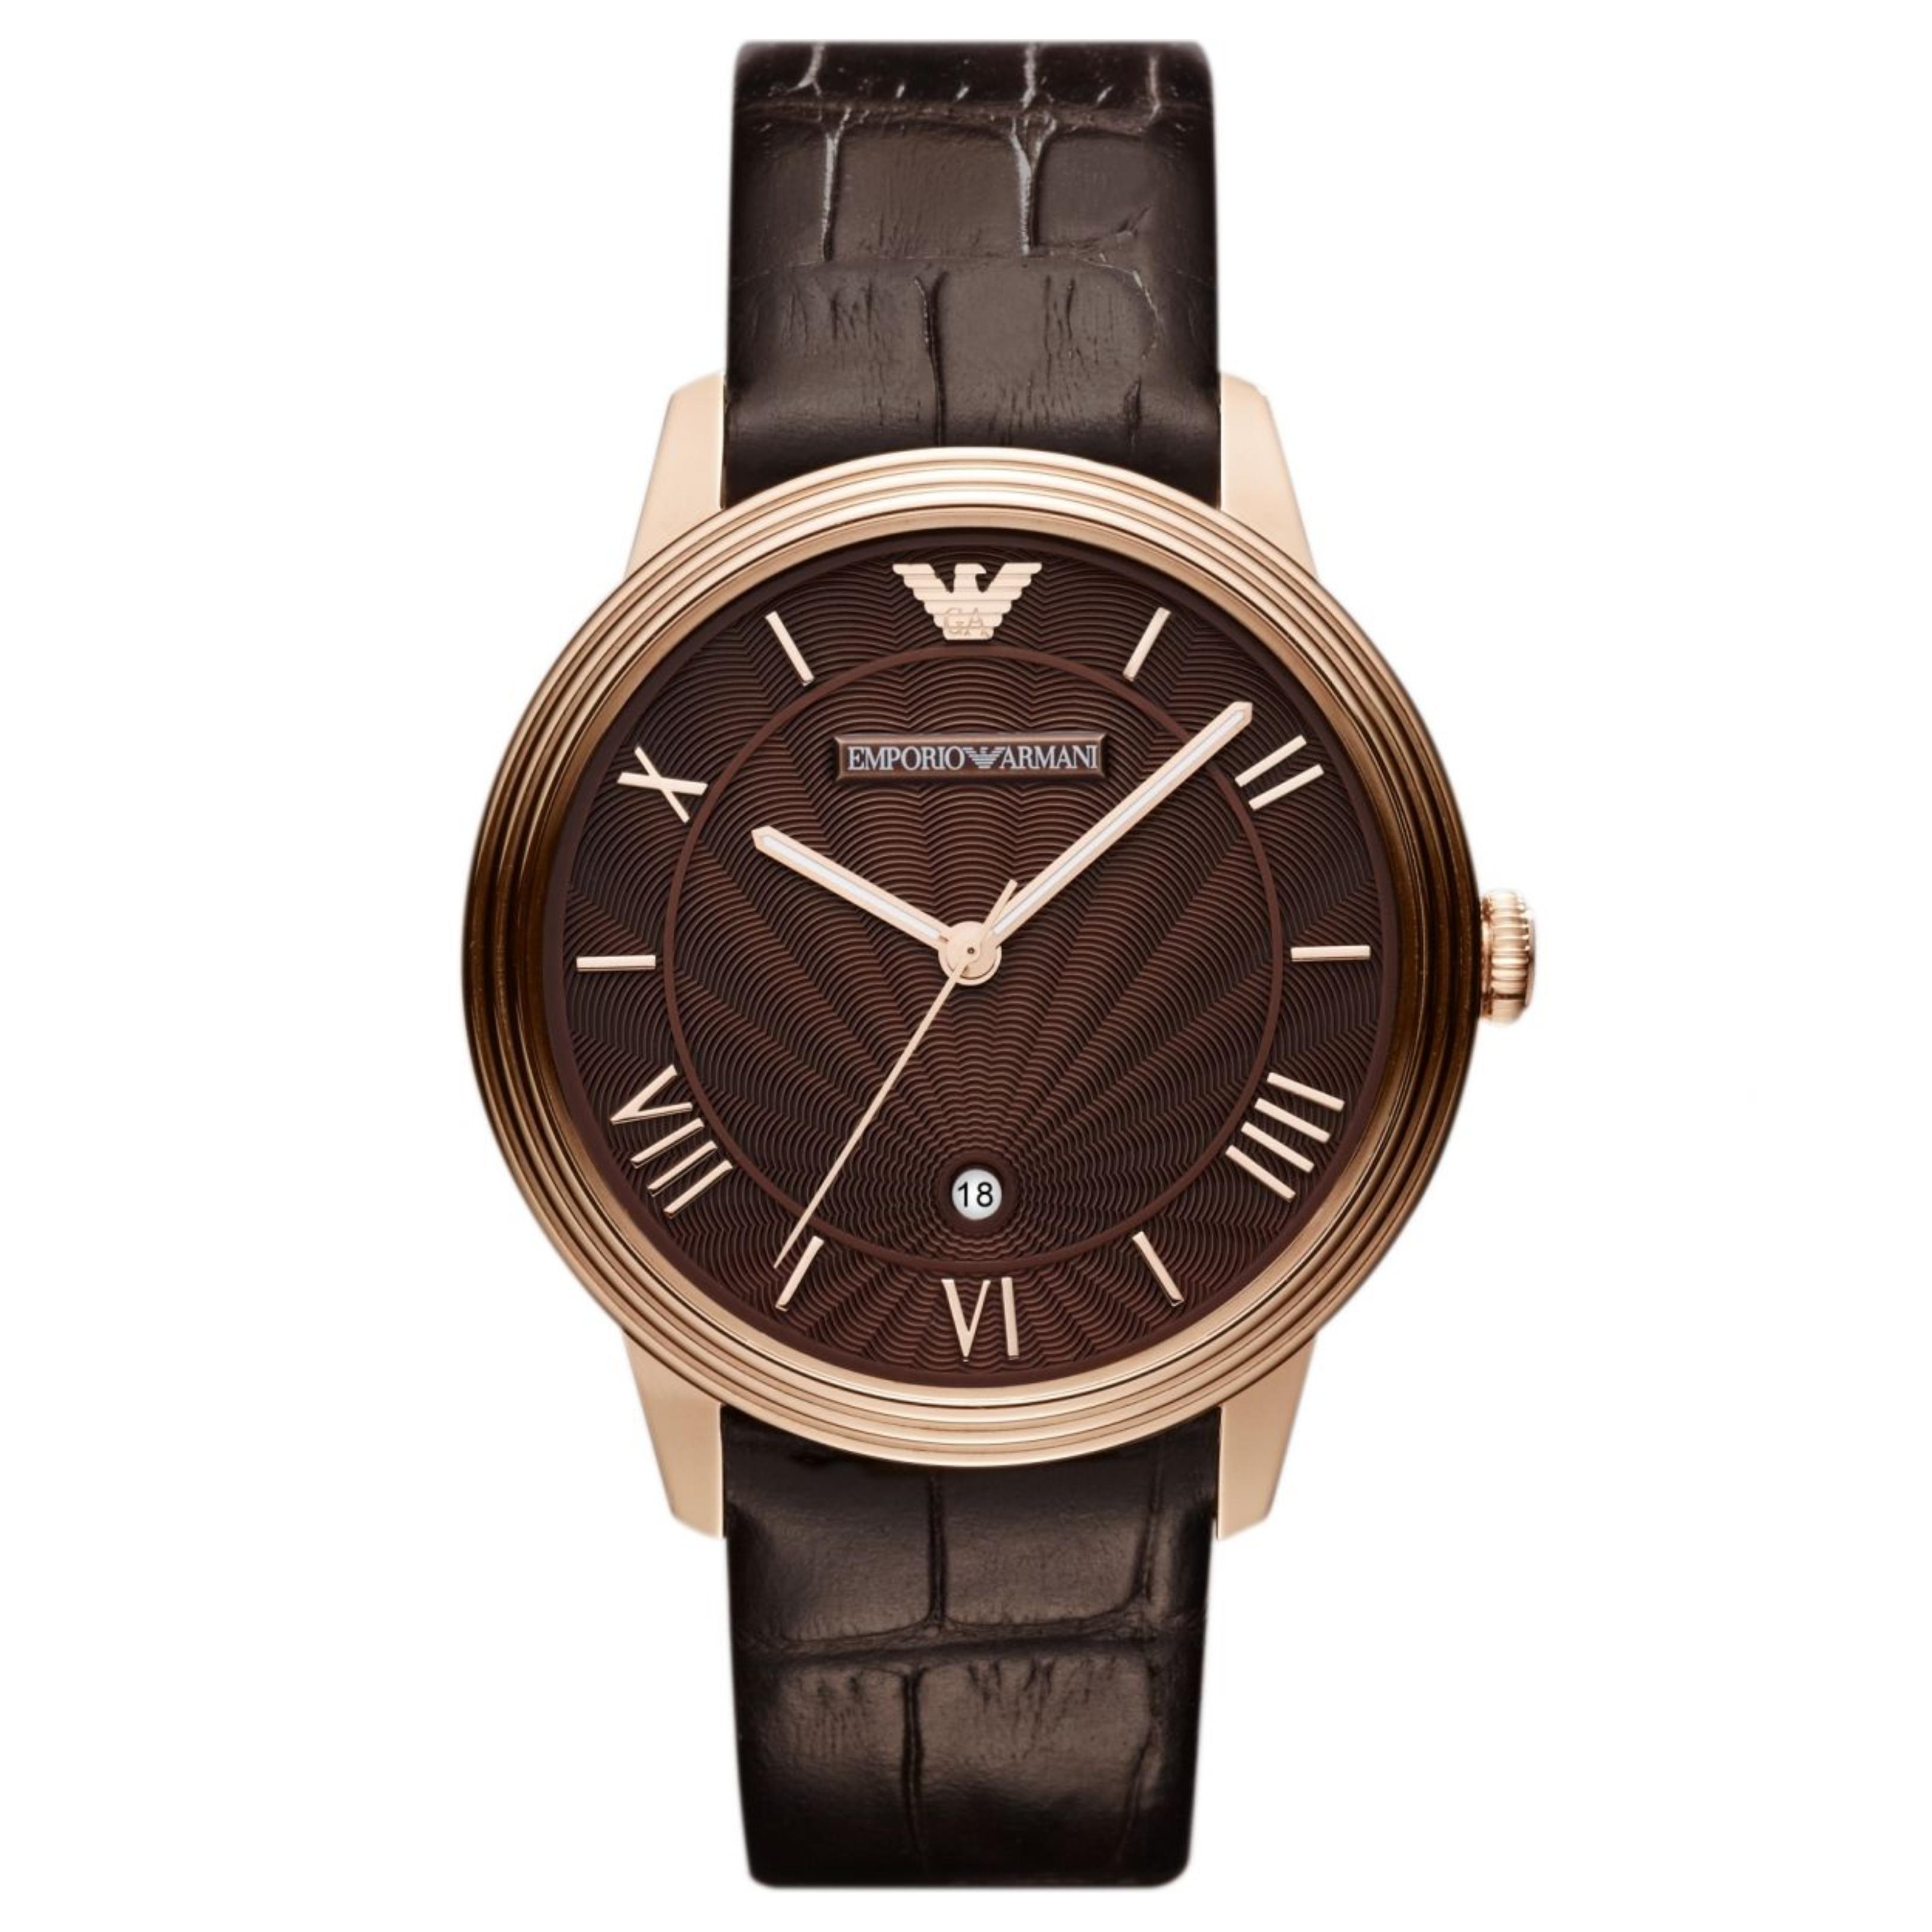 Emporio Armani Men's Watch|Roman Numerals Brown Dail|Brown Leather Strap|AR1613